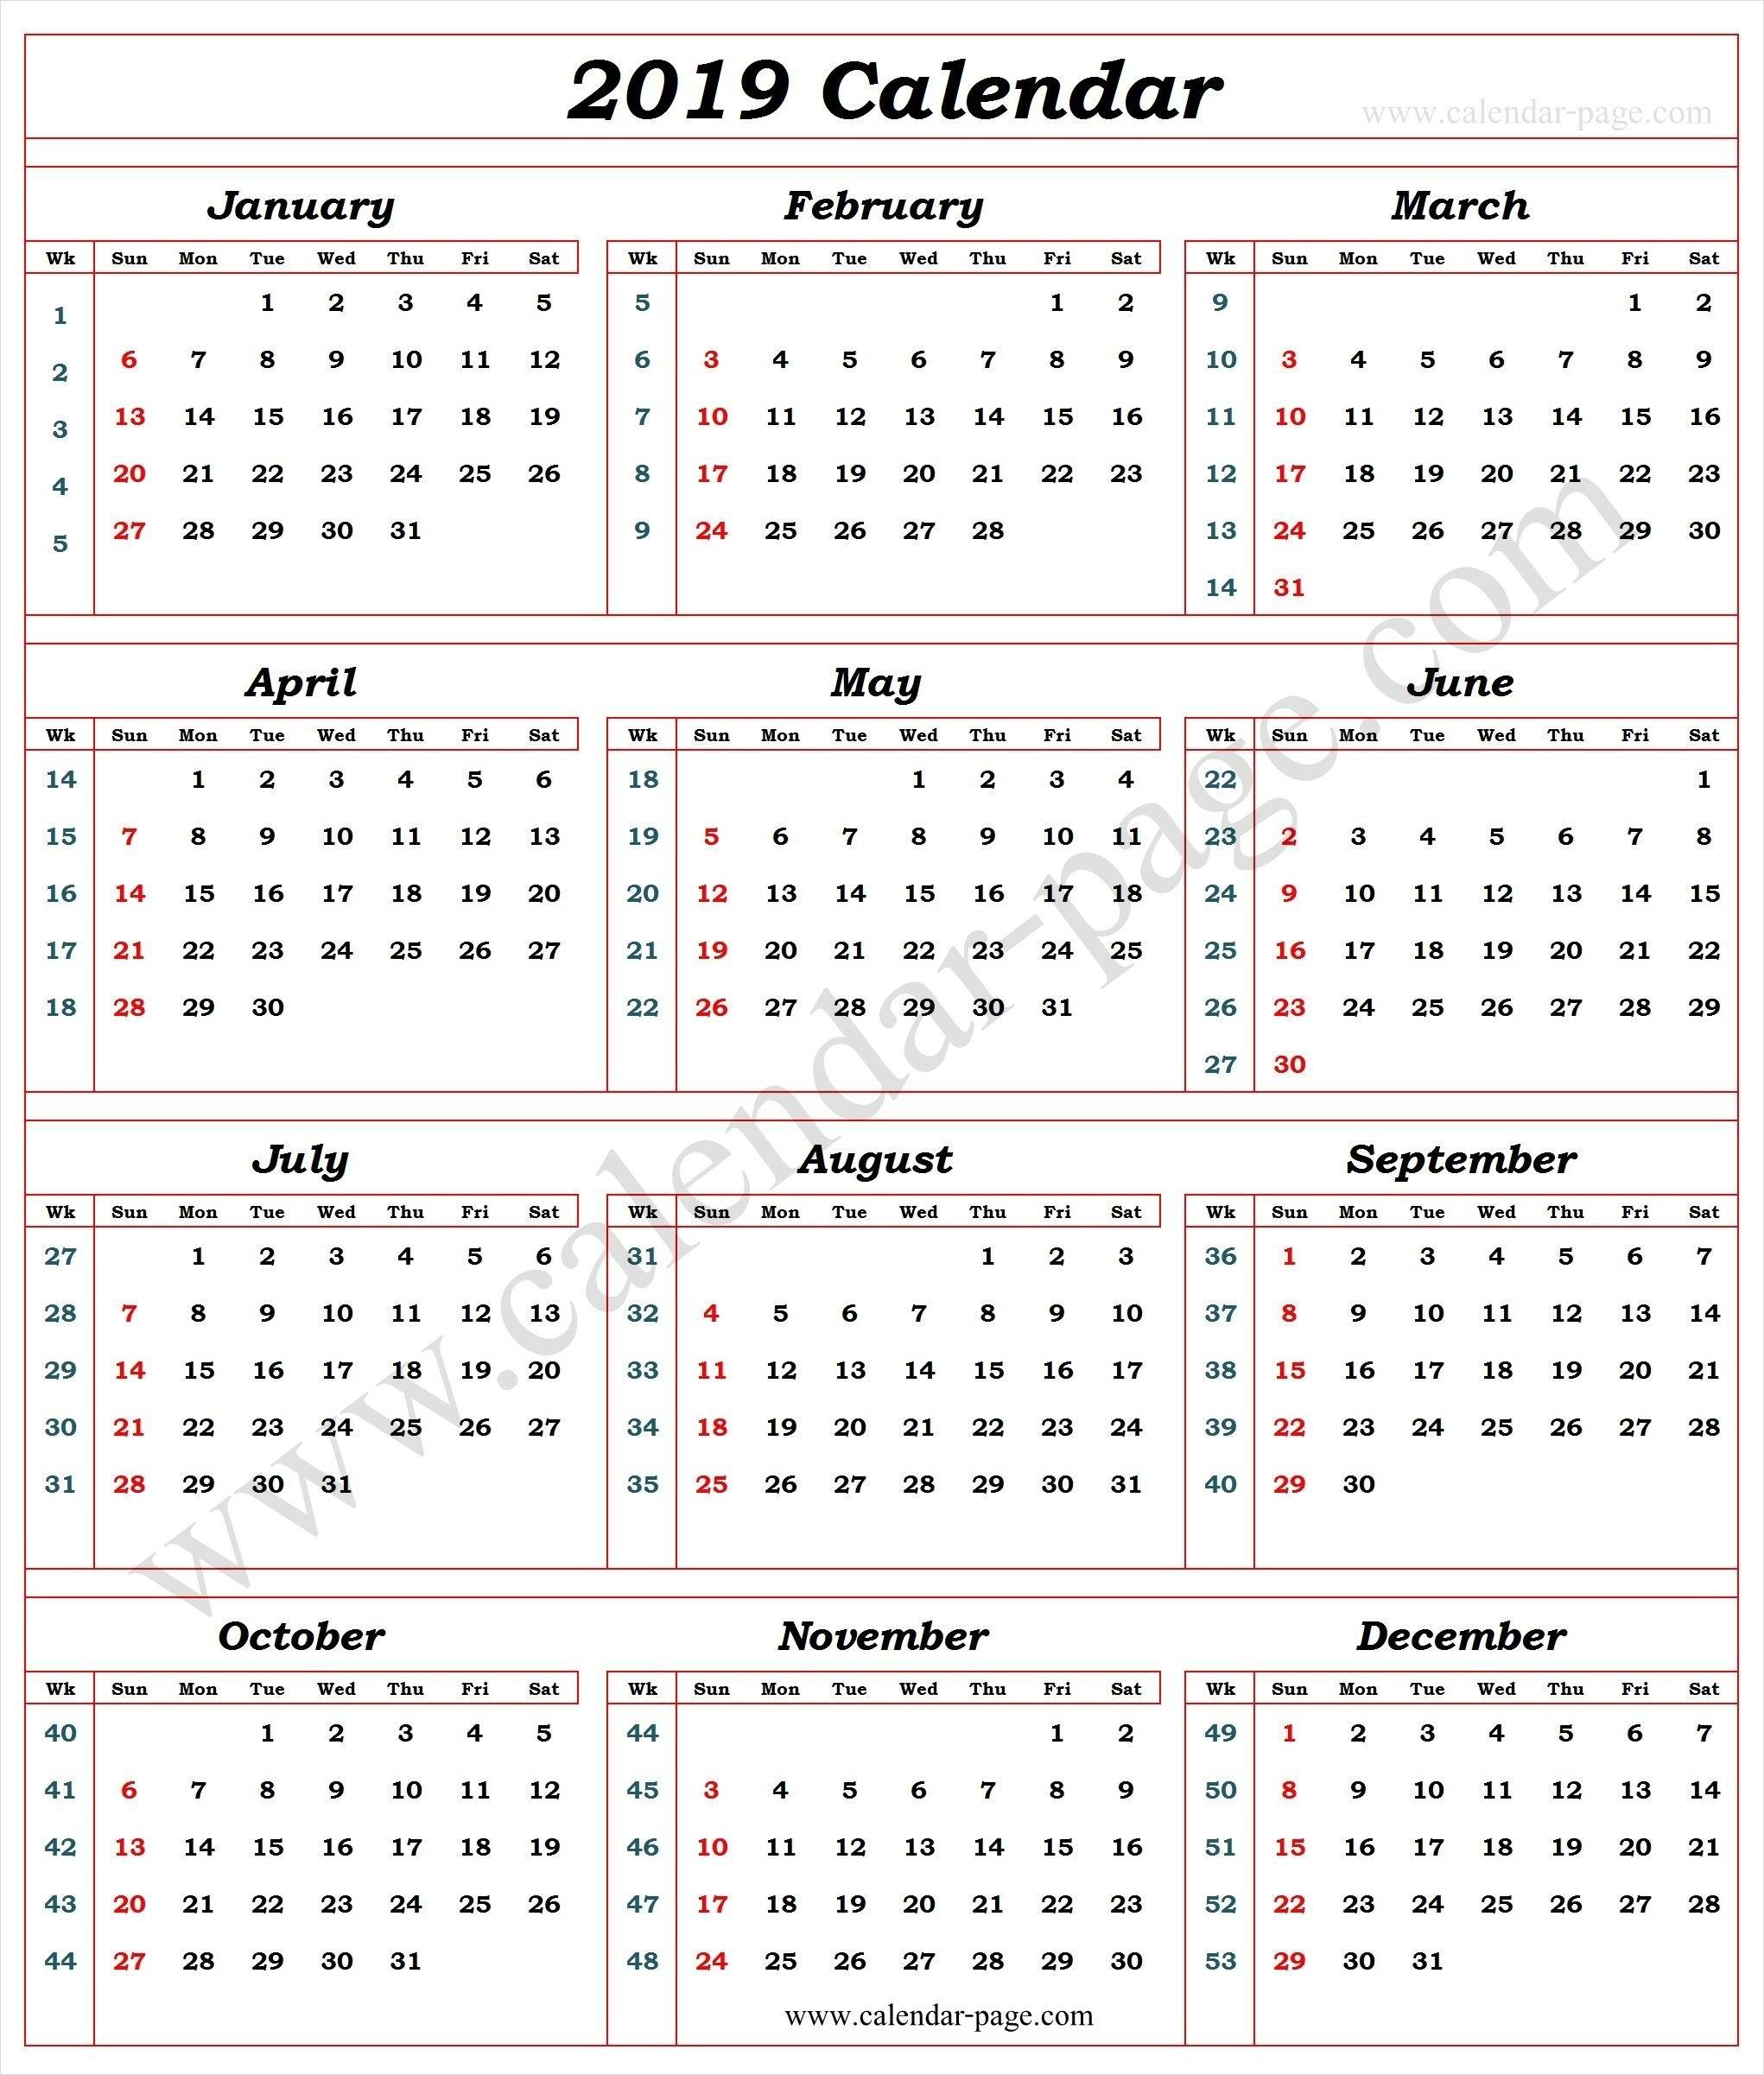 Calendar 2019 With Week Numbers   2019 Calendar Template   Pinterest Calendar 2019 By Week